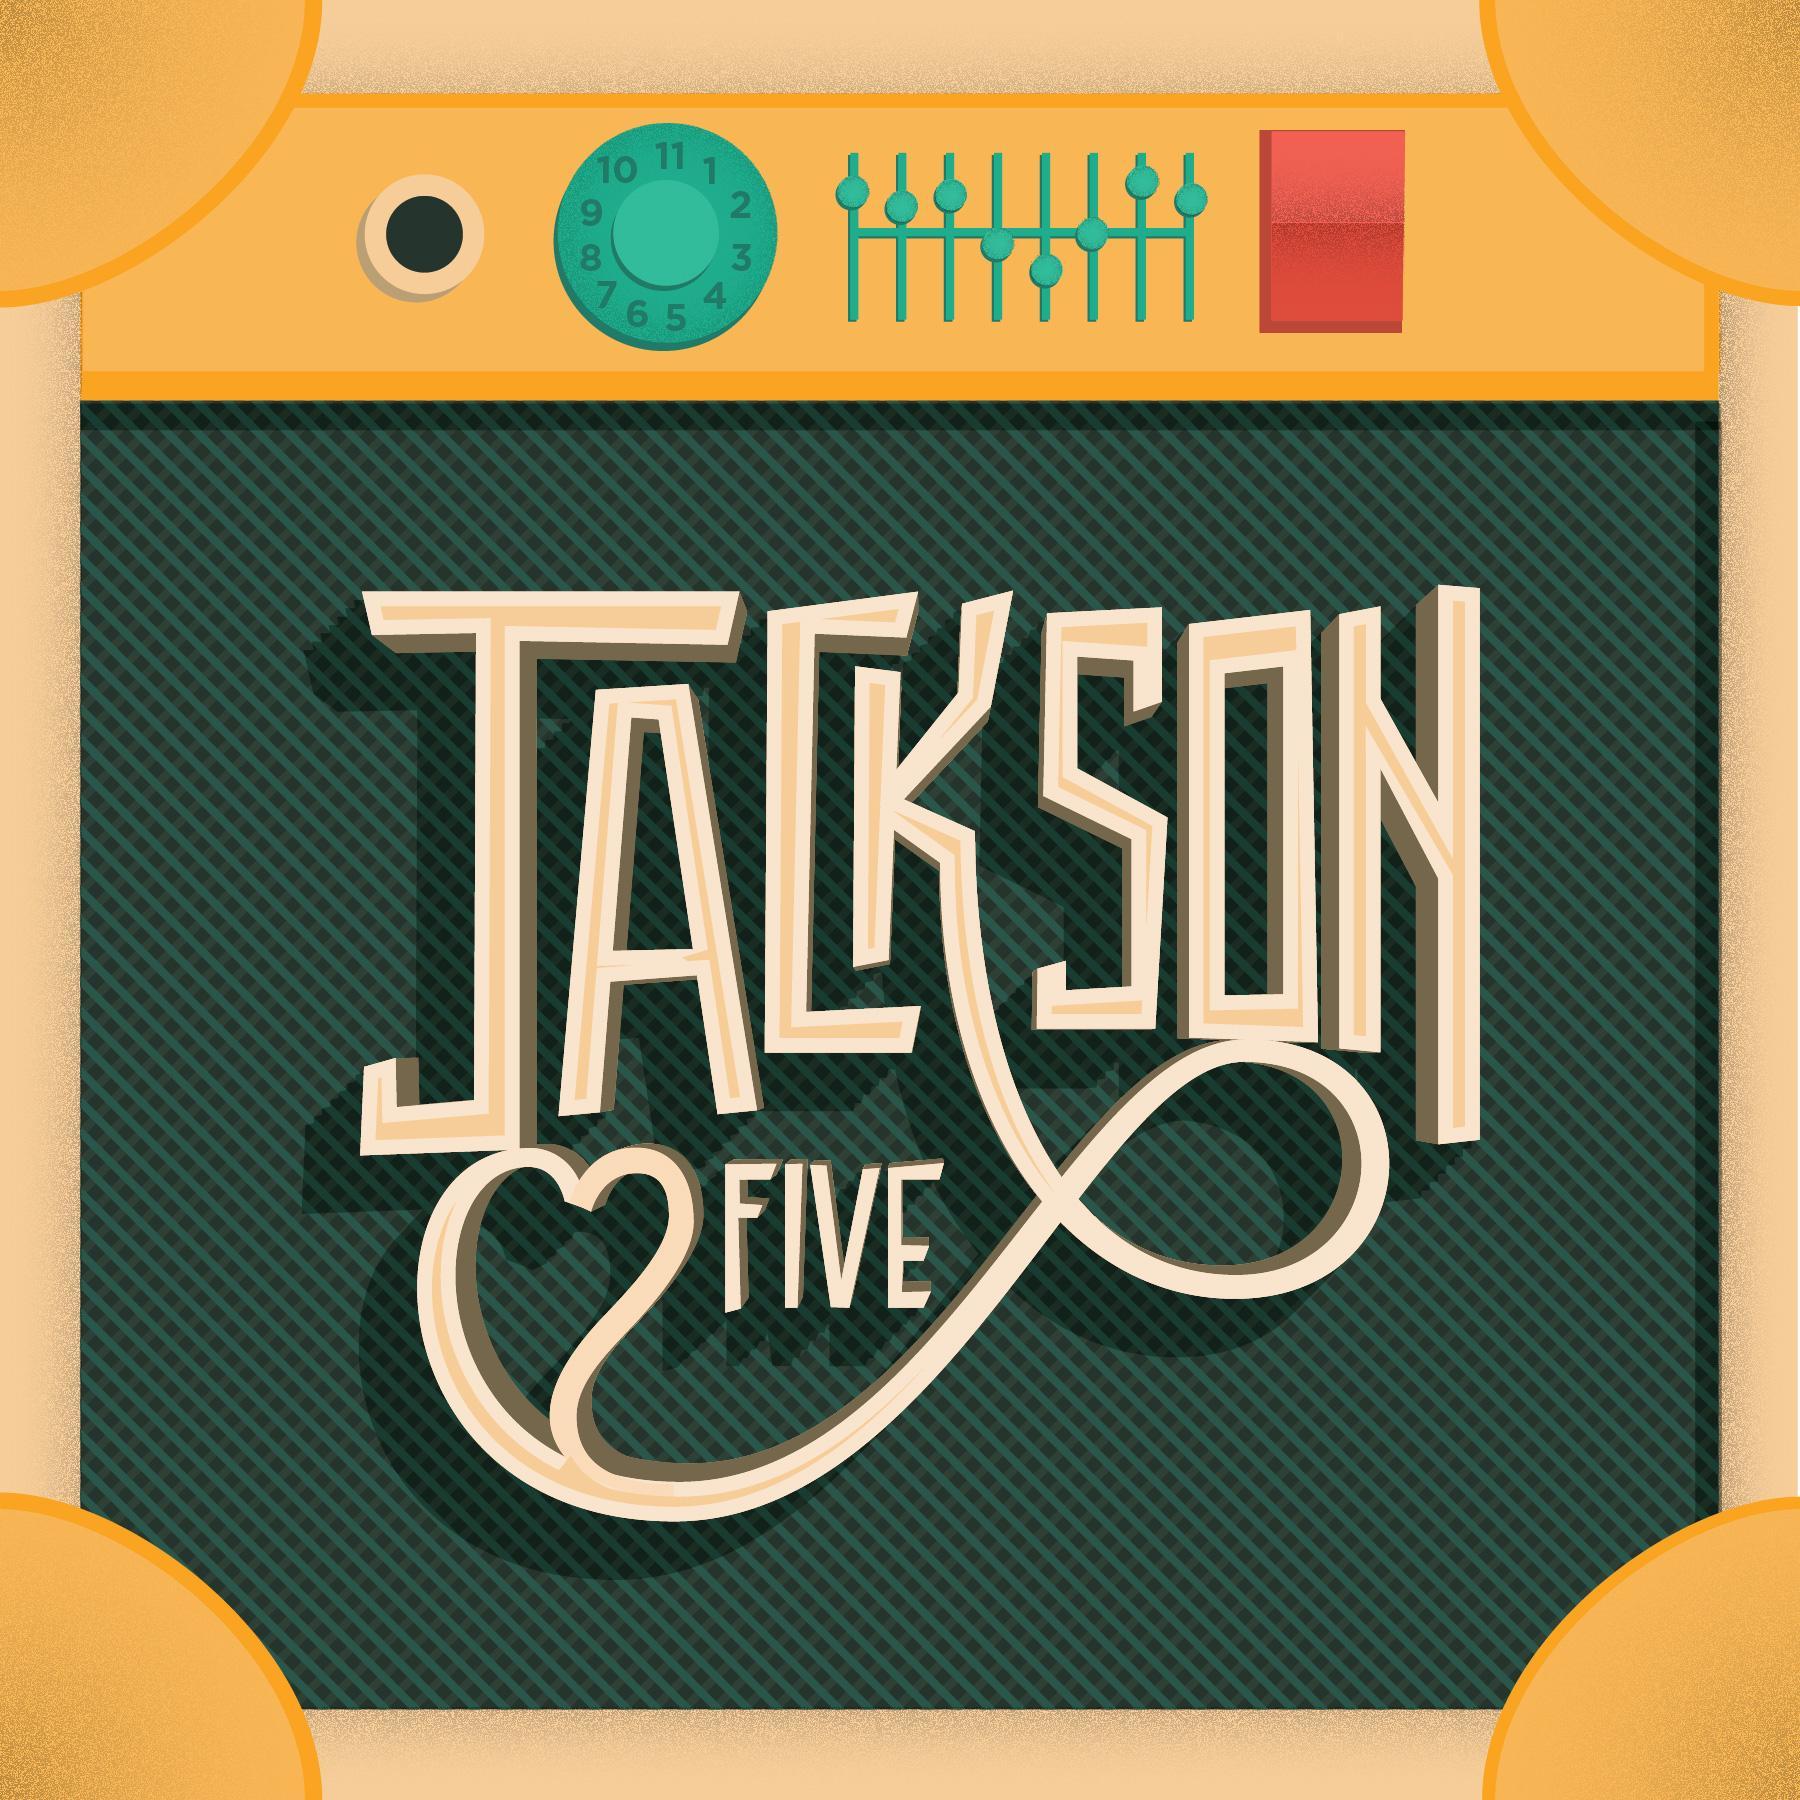 Jackson 5 / logo reinterpretation  & Tom Petty - Stand Your Ground    - image 1 - student project